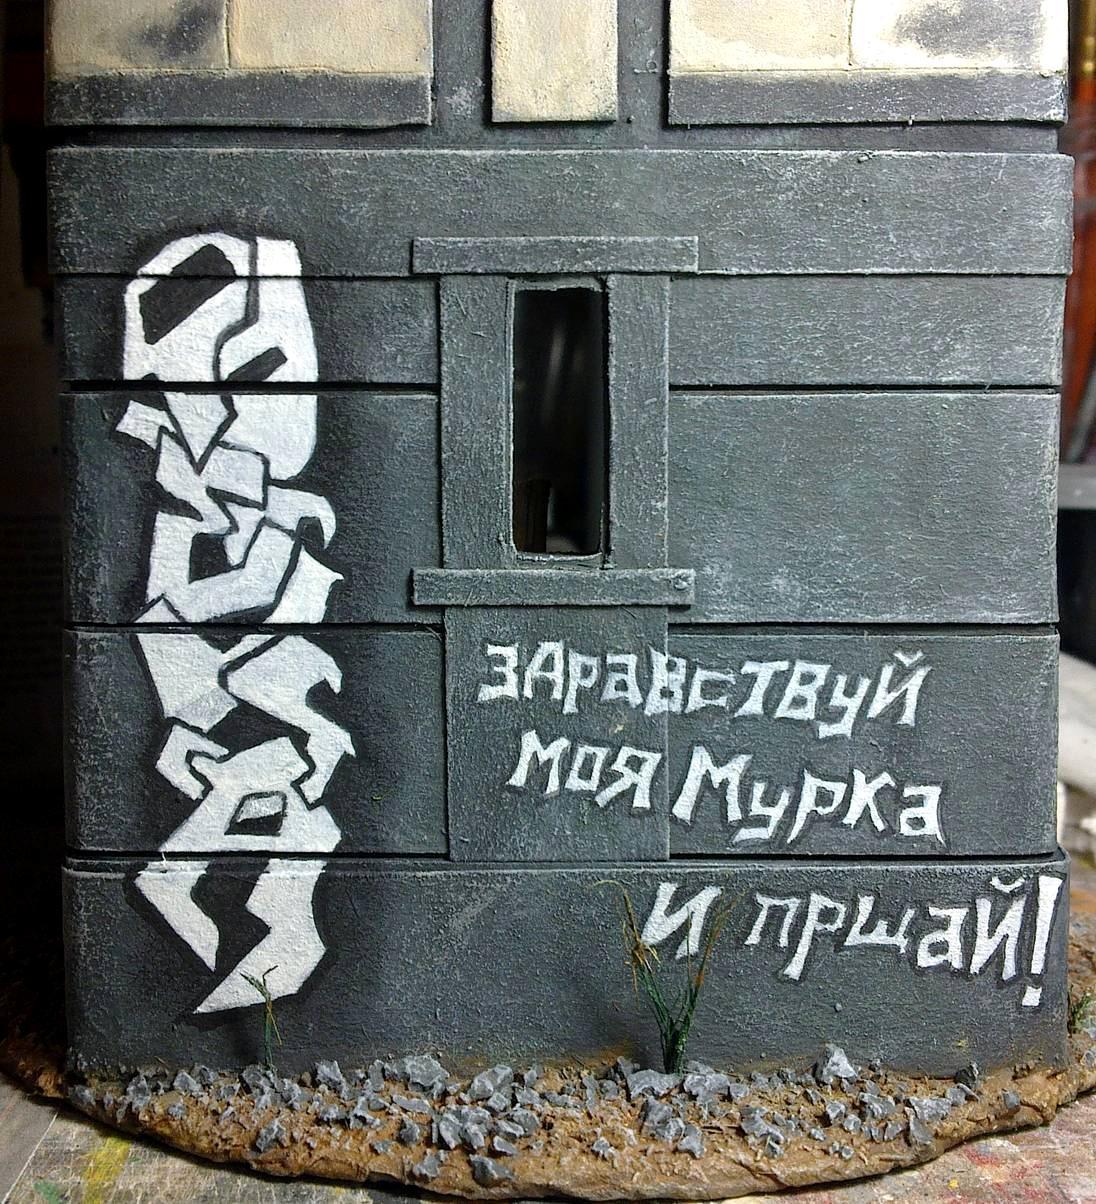 Graven's tower pip 11; graffiti part 2